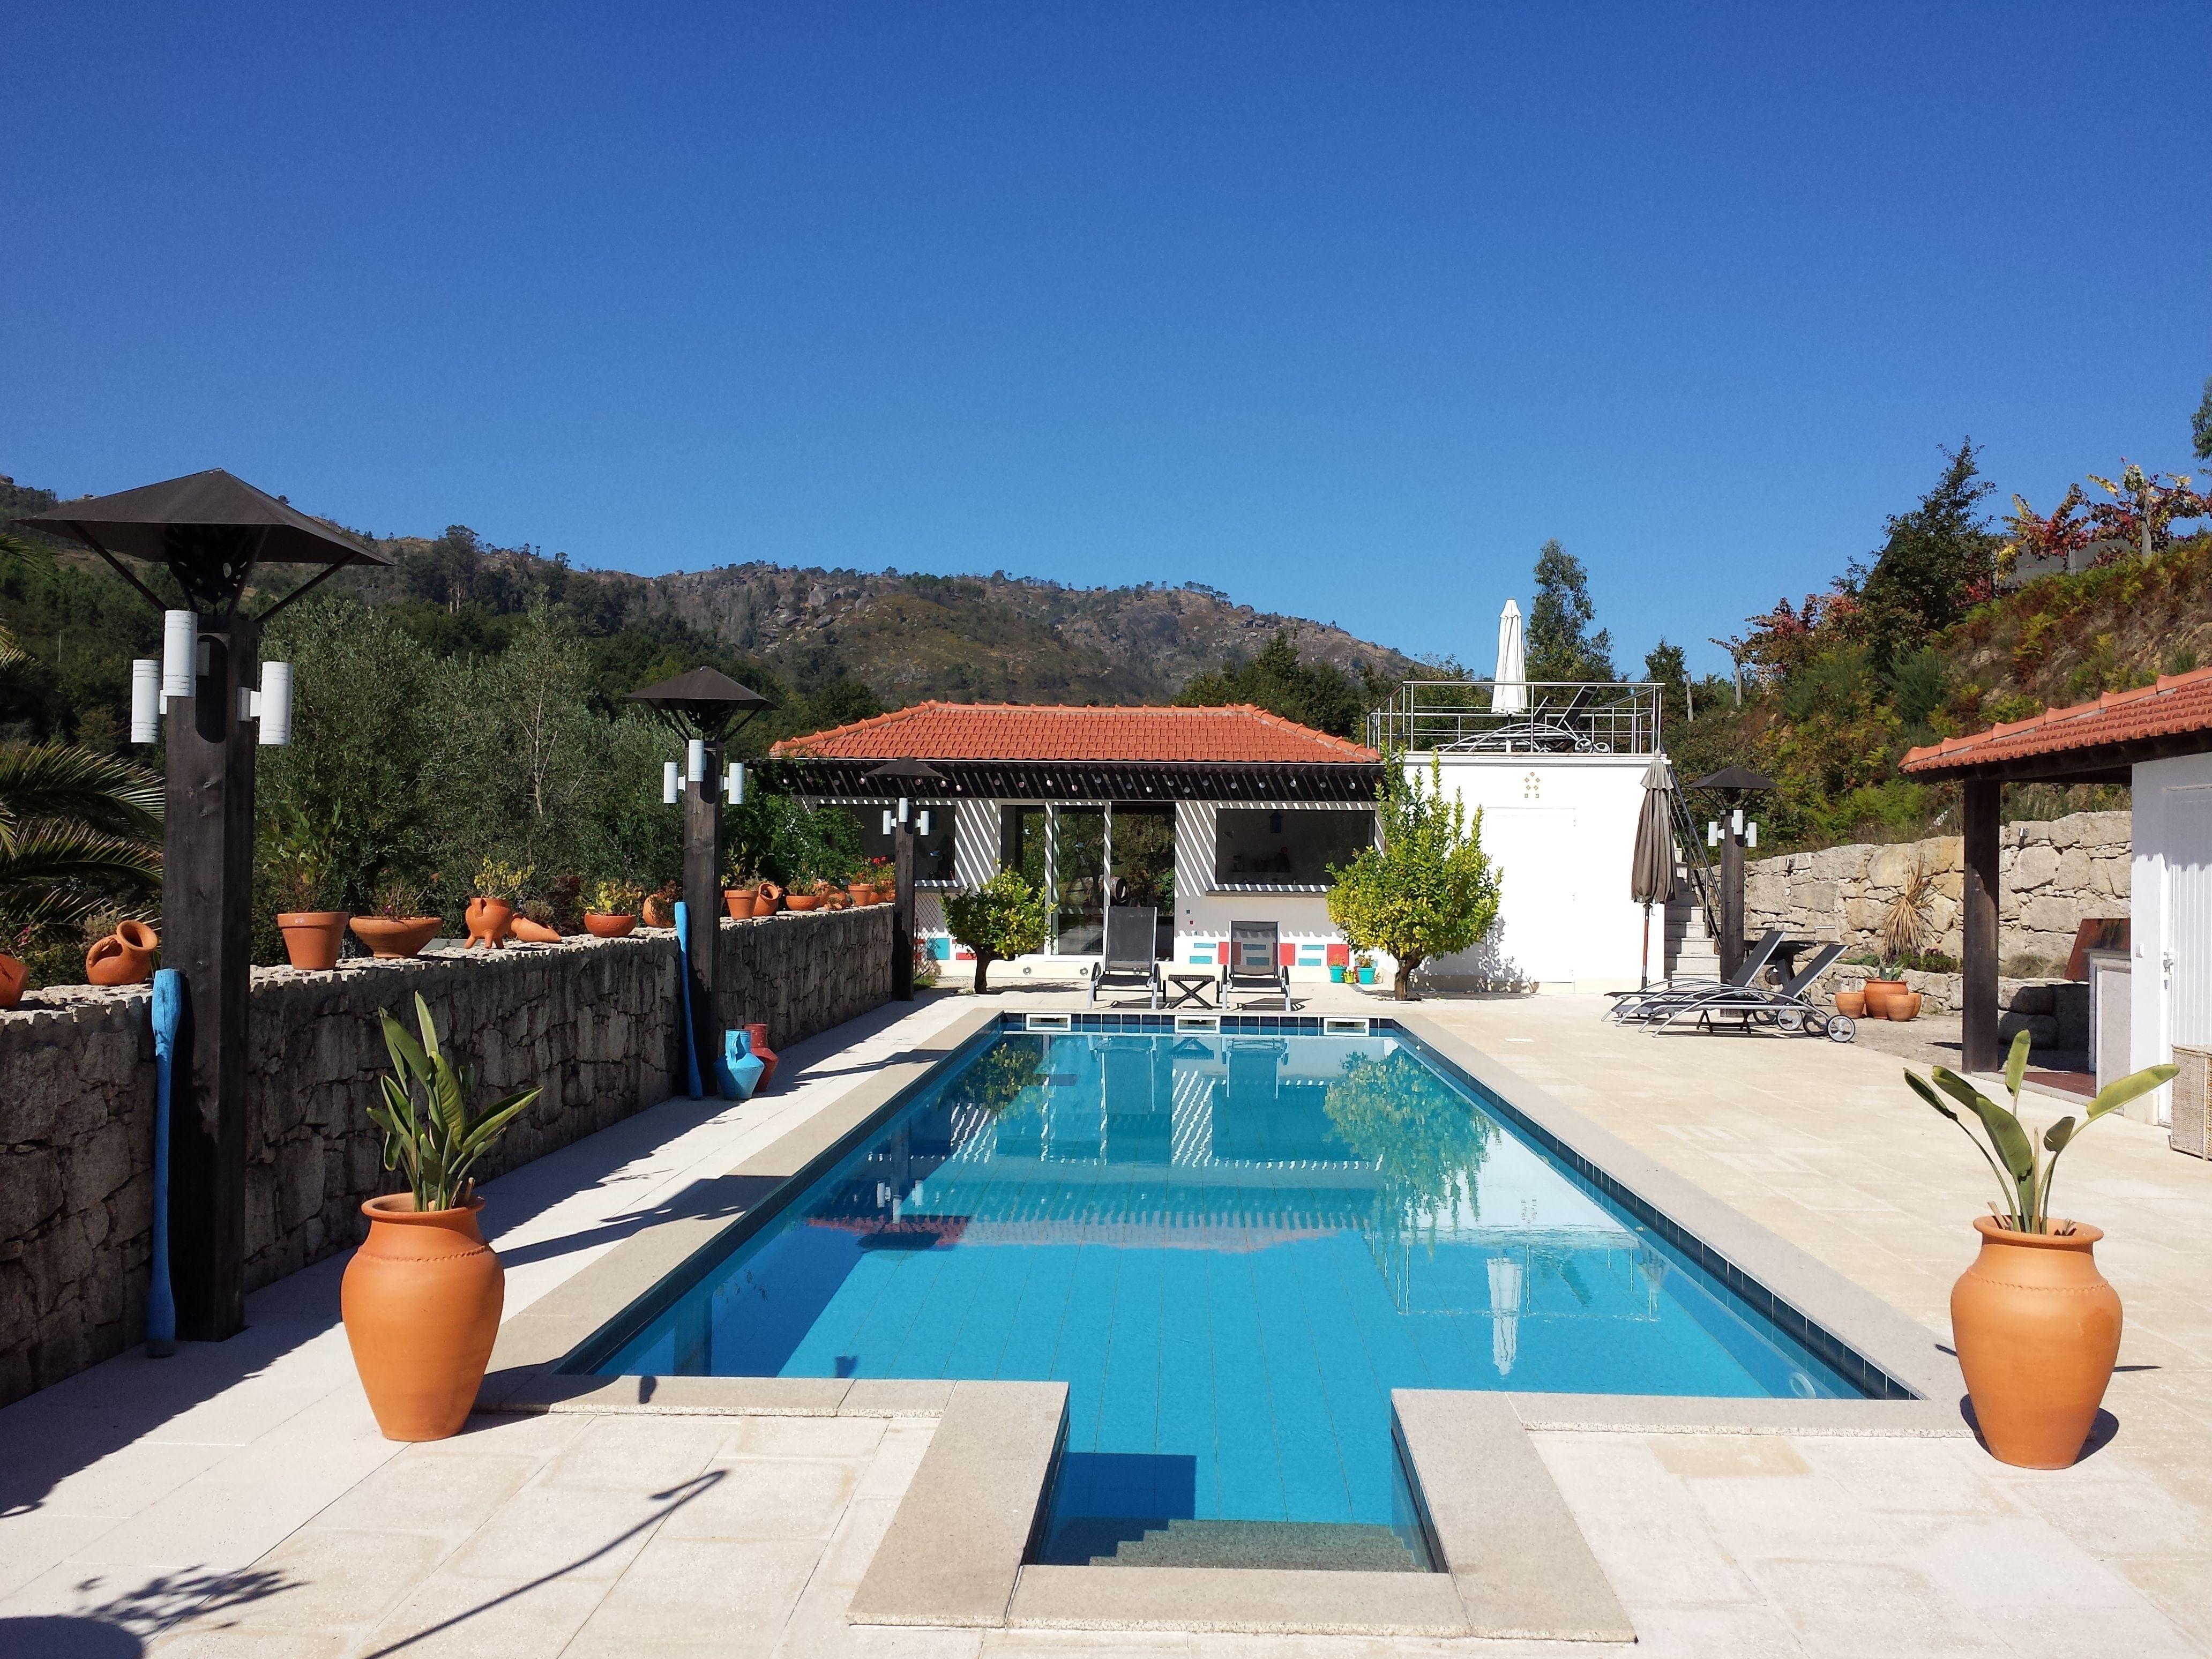 Relaxing at the pool at B&B Quinta da Cumieira Portugal #LuxuryBeddingBreakfast